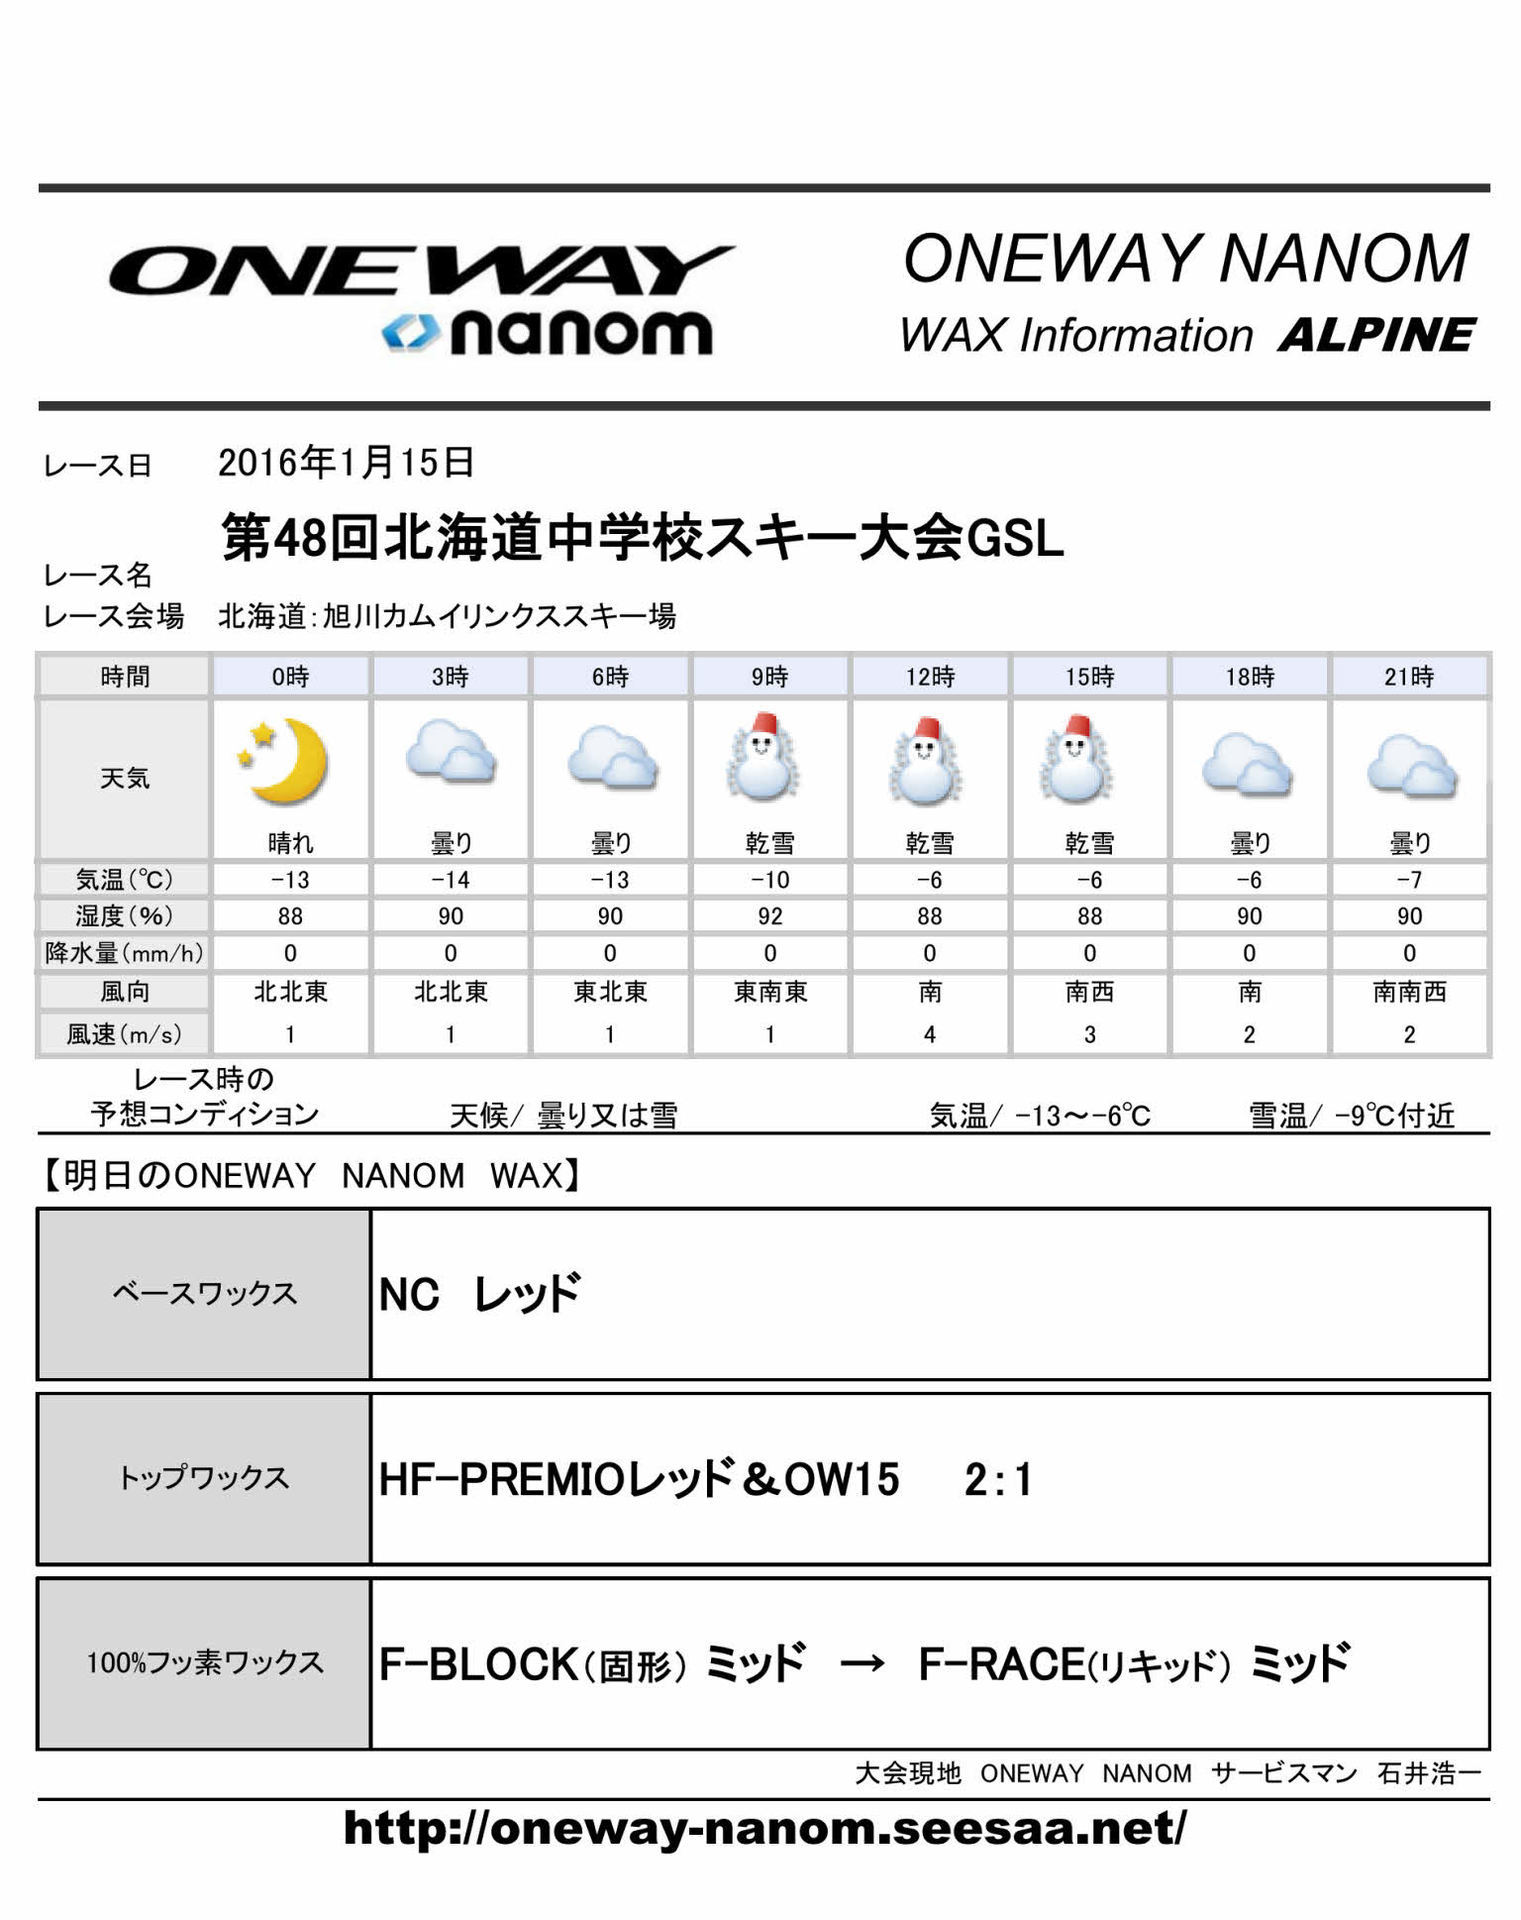 A-16-1-15旭川カムイリンクス全道中学.jpg